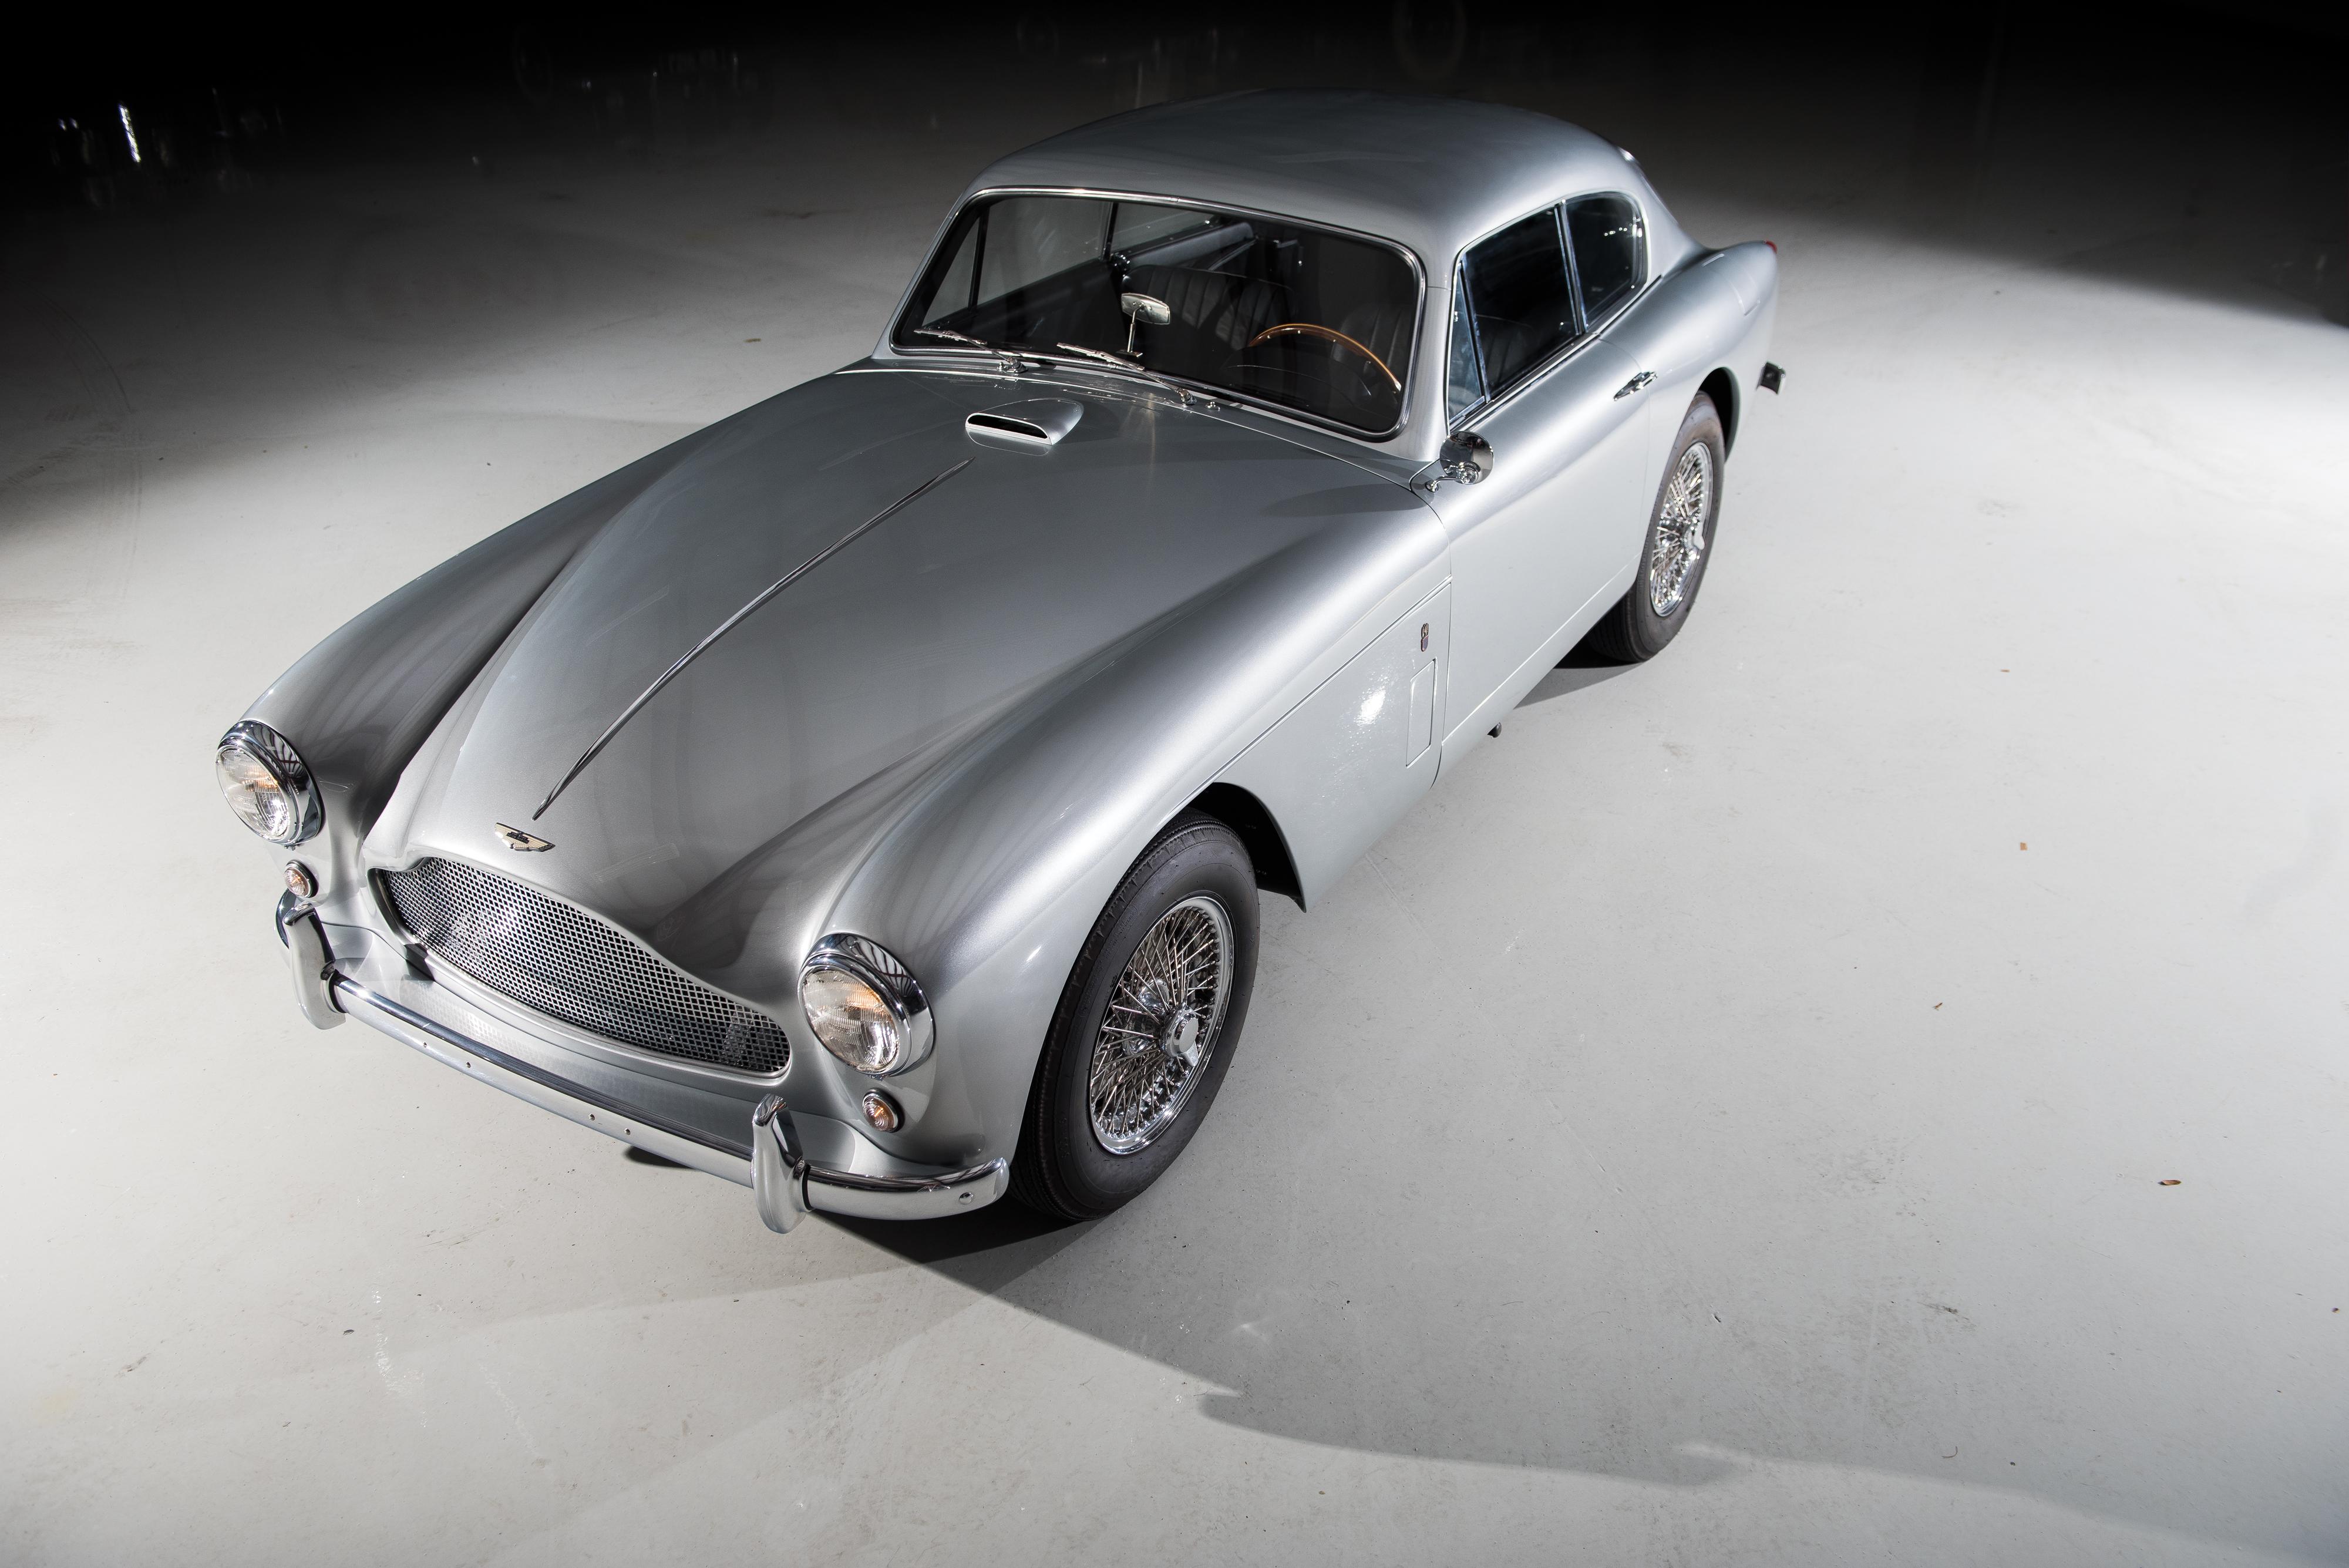 1959 Aston Martin Db Mk Iii Values Hagerty Valuation Tool